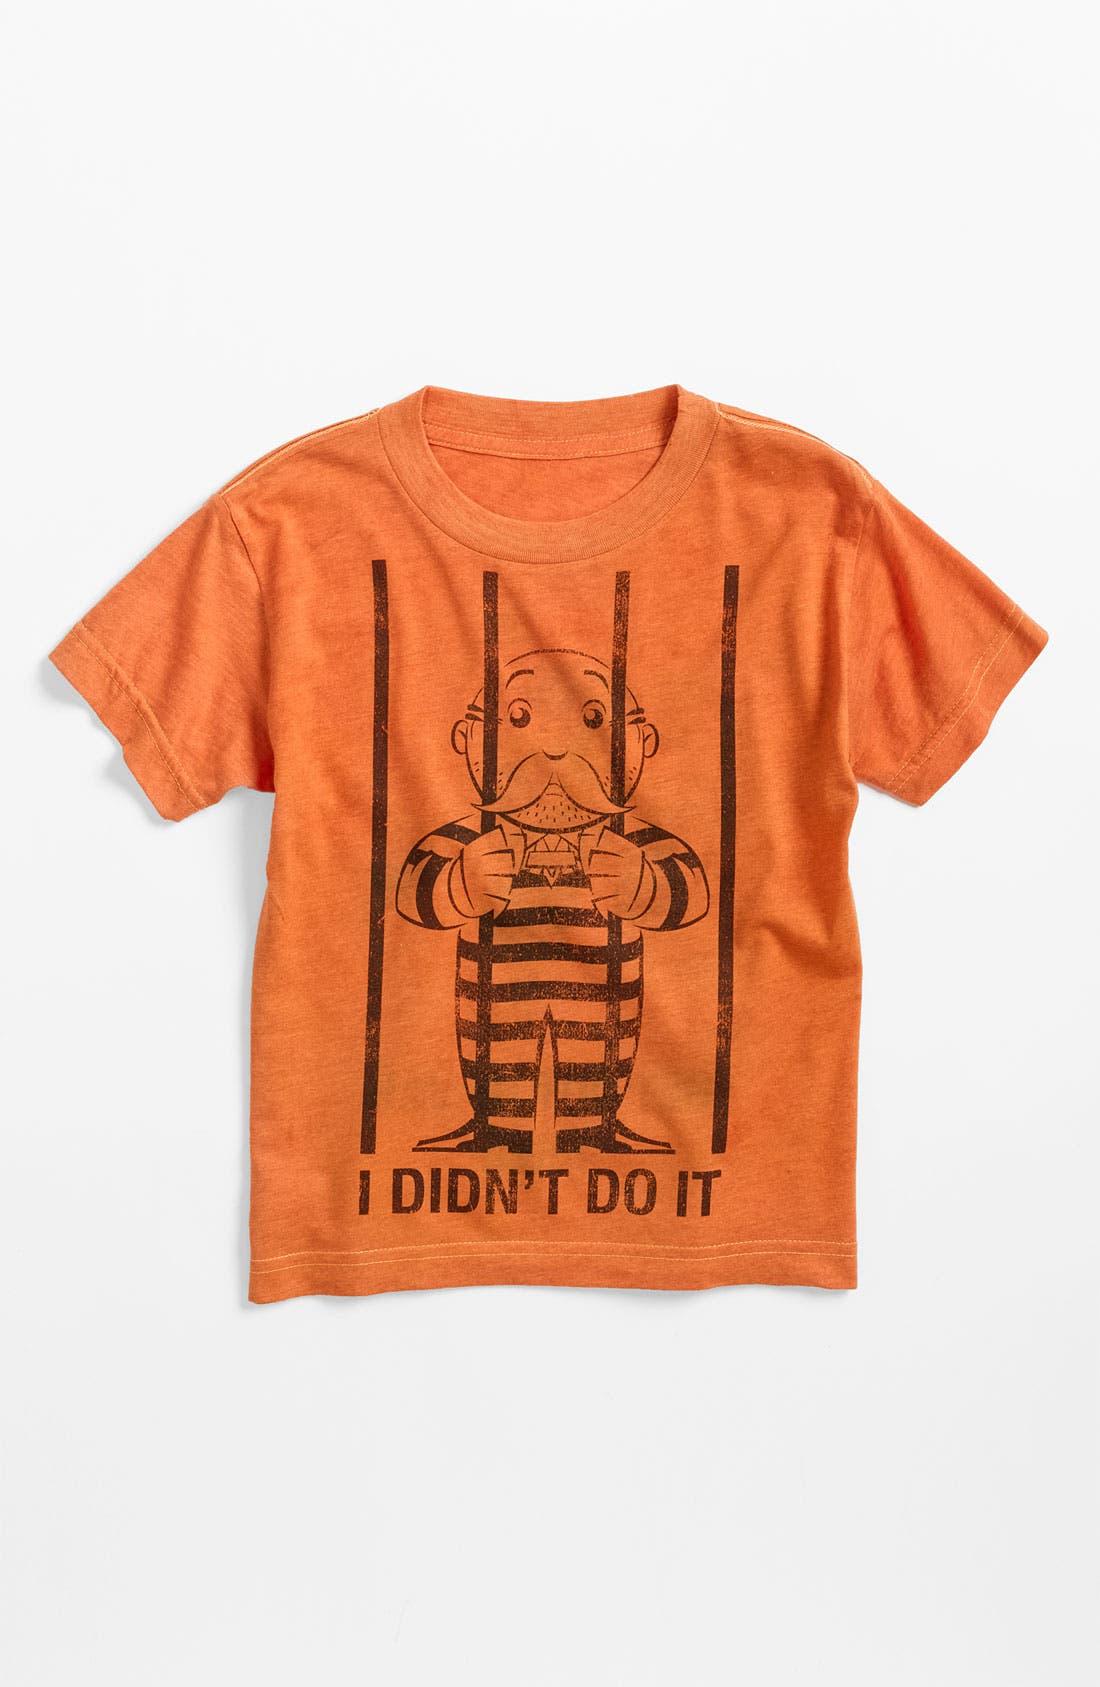 Main Image - Jem 'Monopoly® Jail' Reversible T-Shirt (Little Boys)